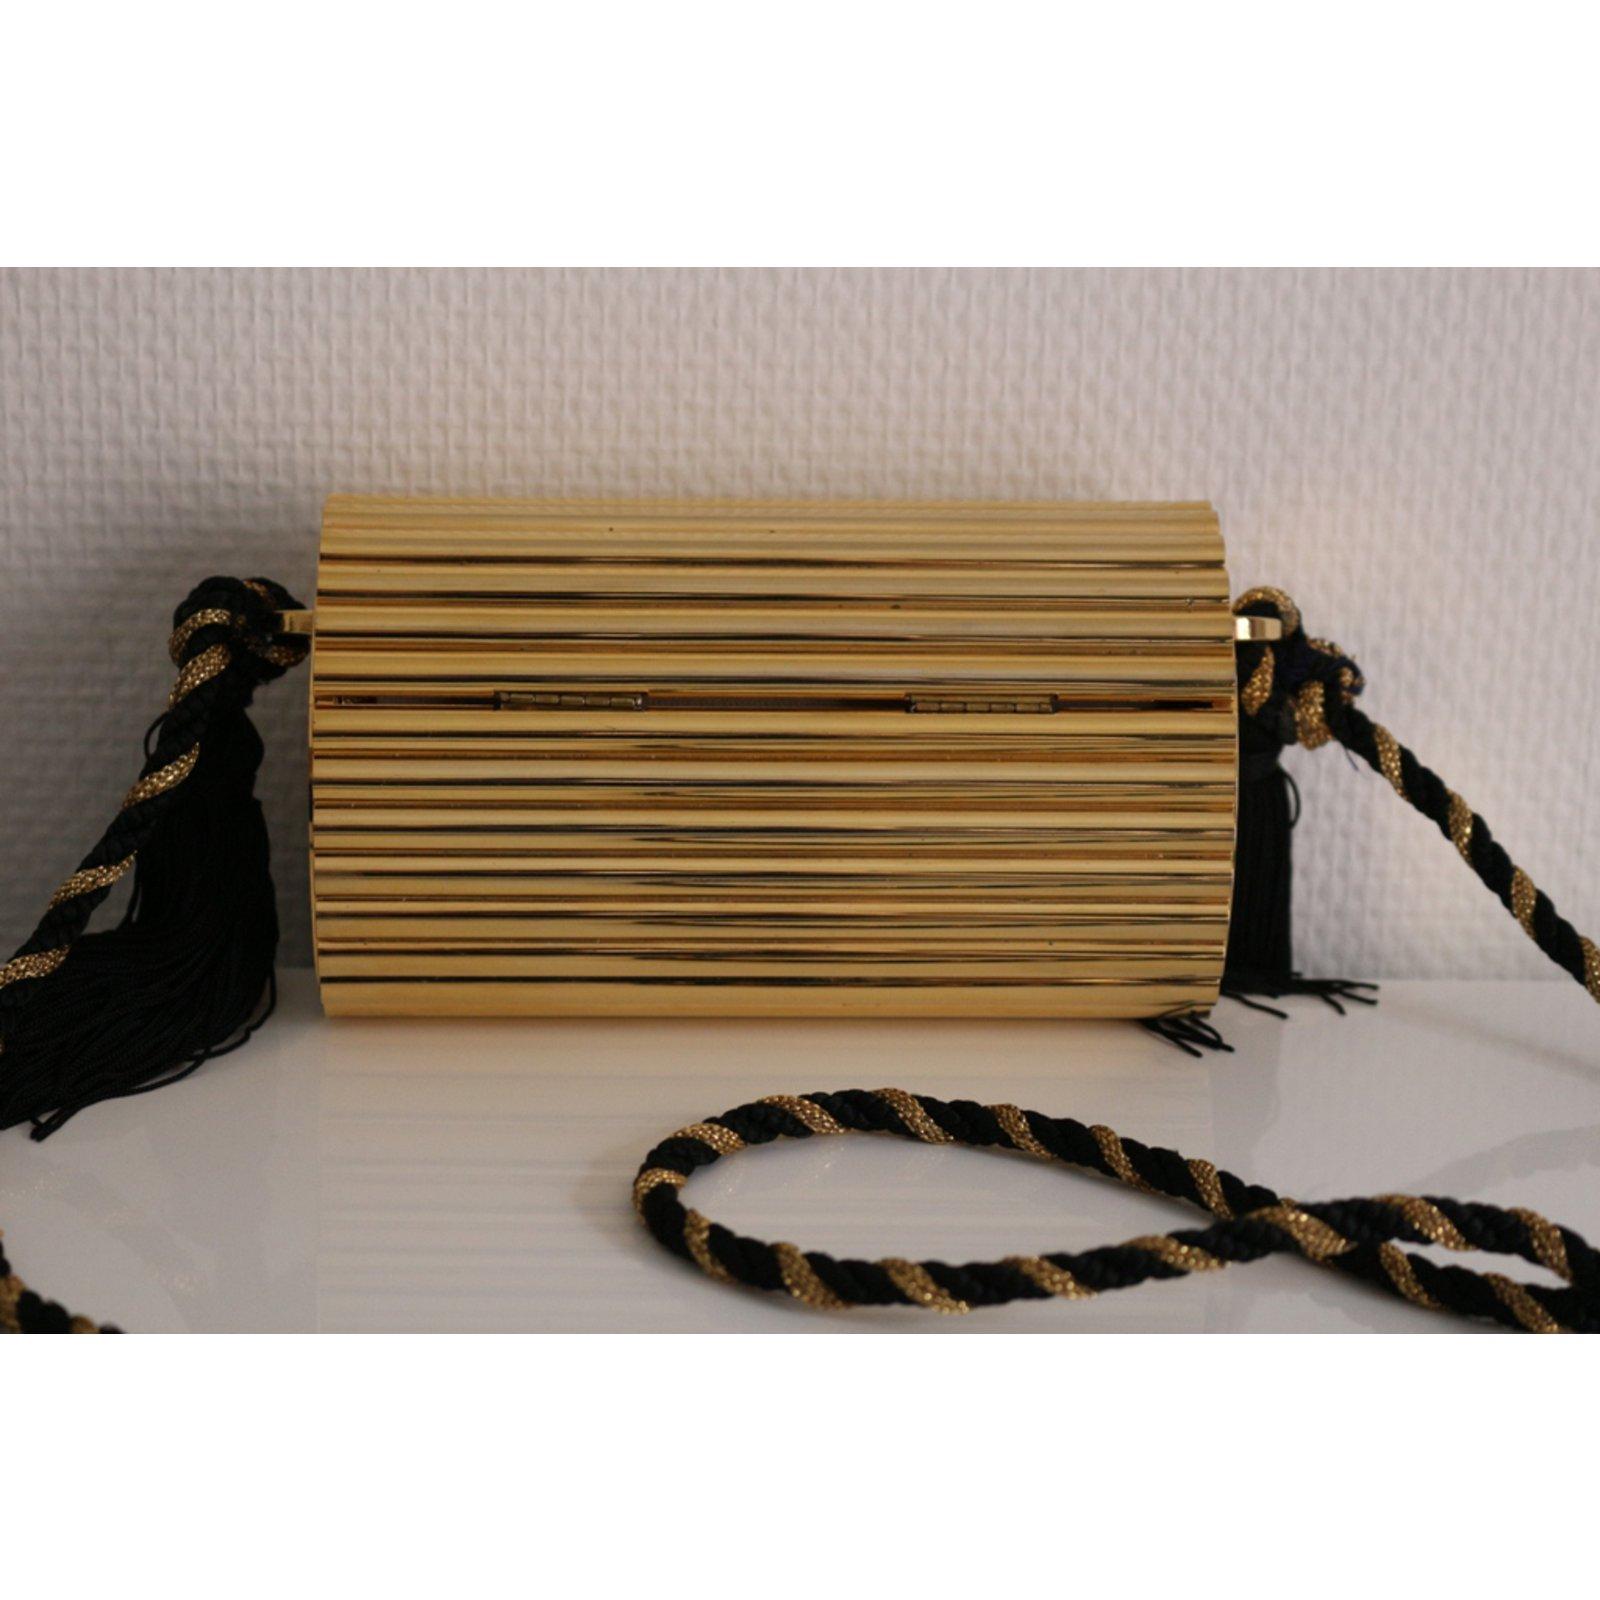 2df2a911d436d Facebook · Pin This. Yves Saint Laurent Bag Handbags Plastic Golden ref. 74739